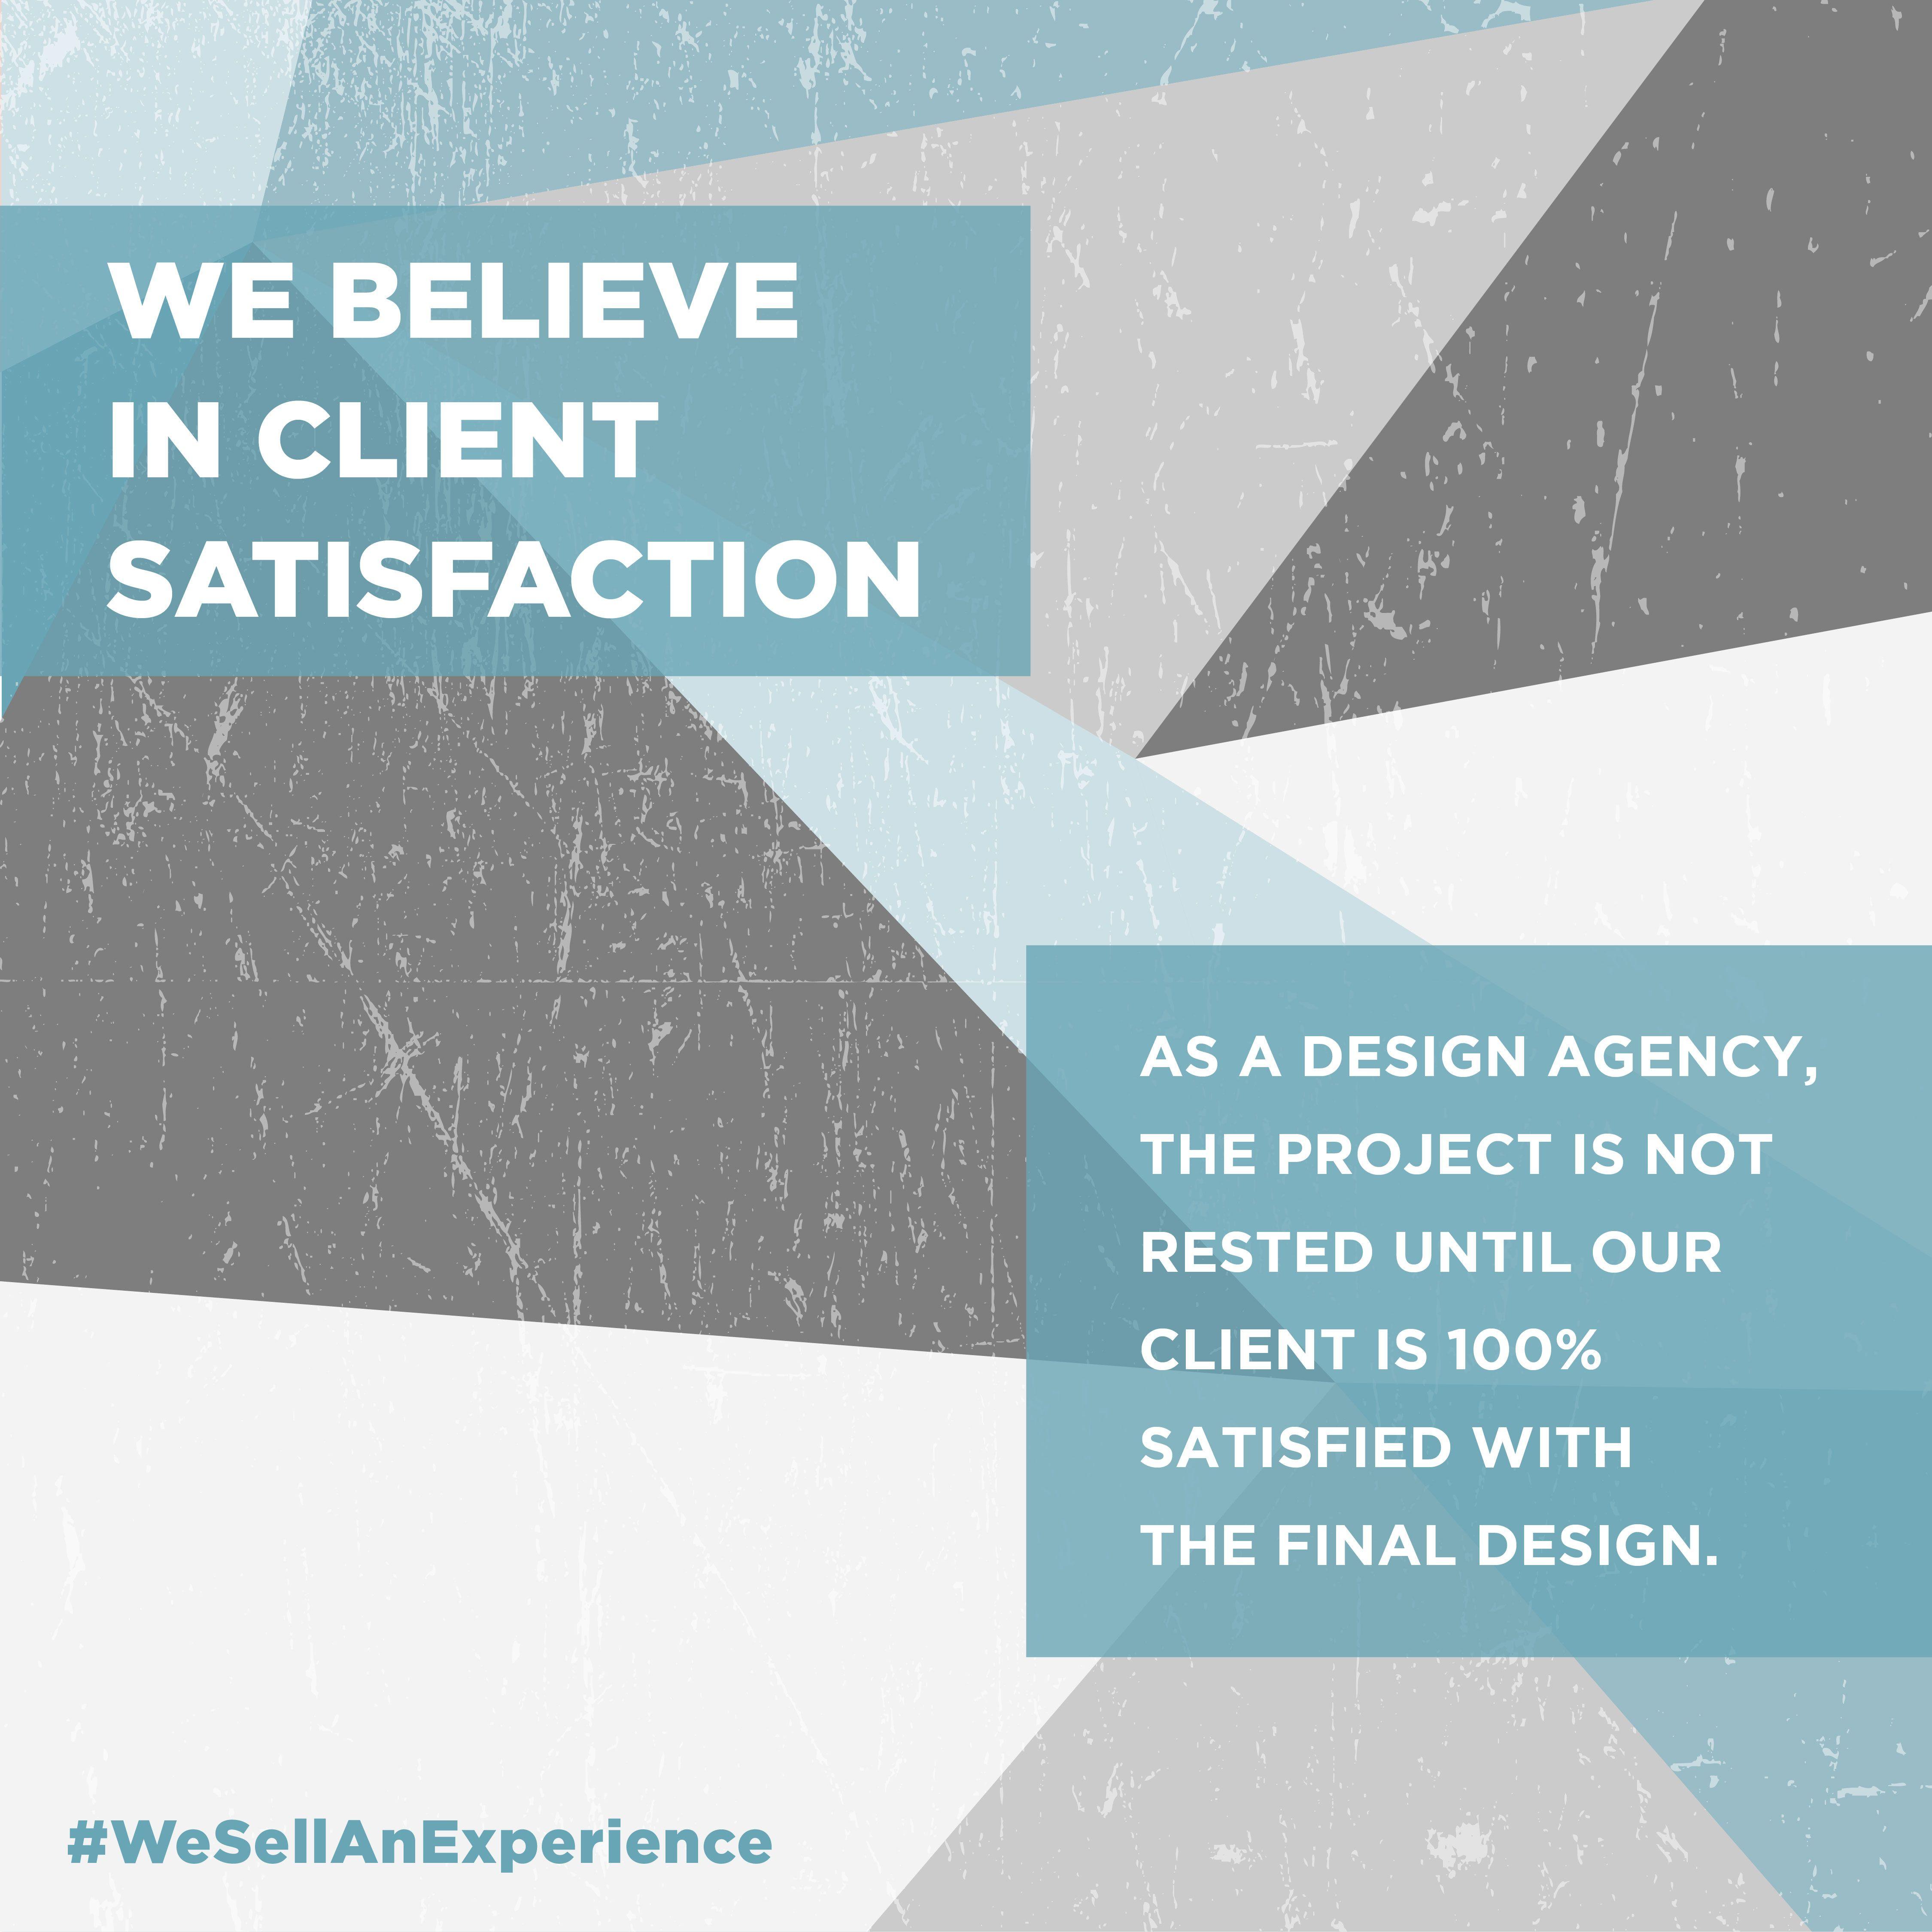 Client satisfaction is our no.1 priority. #BrandingSecret #AquaDesignWorks #AquaLogoWorks #Logo #Branding #BrandDesign #Branding #MotivationThursdays #BrandingThursdays #BrandingDesign #BrandIdentity #BrandingIdentity #Branding101 #Designer #BrandingDesigner #BrandingAgency #Inspiration #BrandingExpert